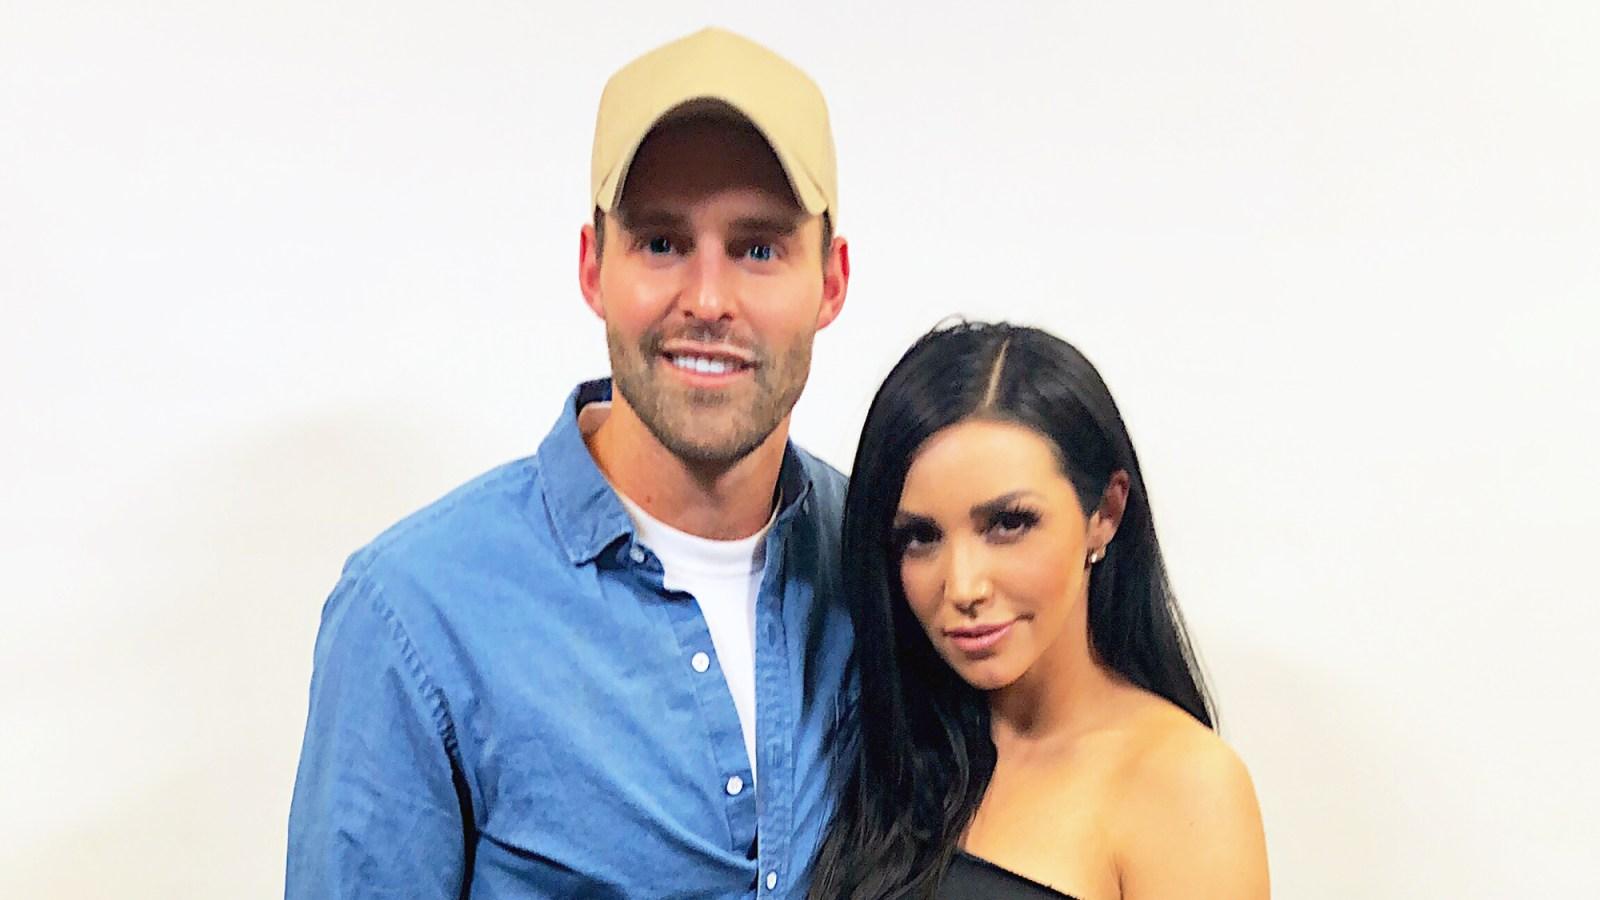 scheana marie dating robert valletta celebrity go dating 2017